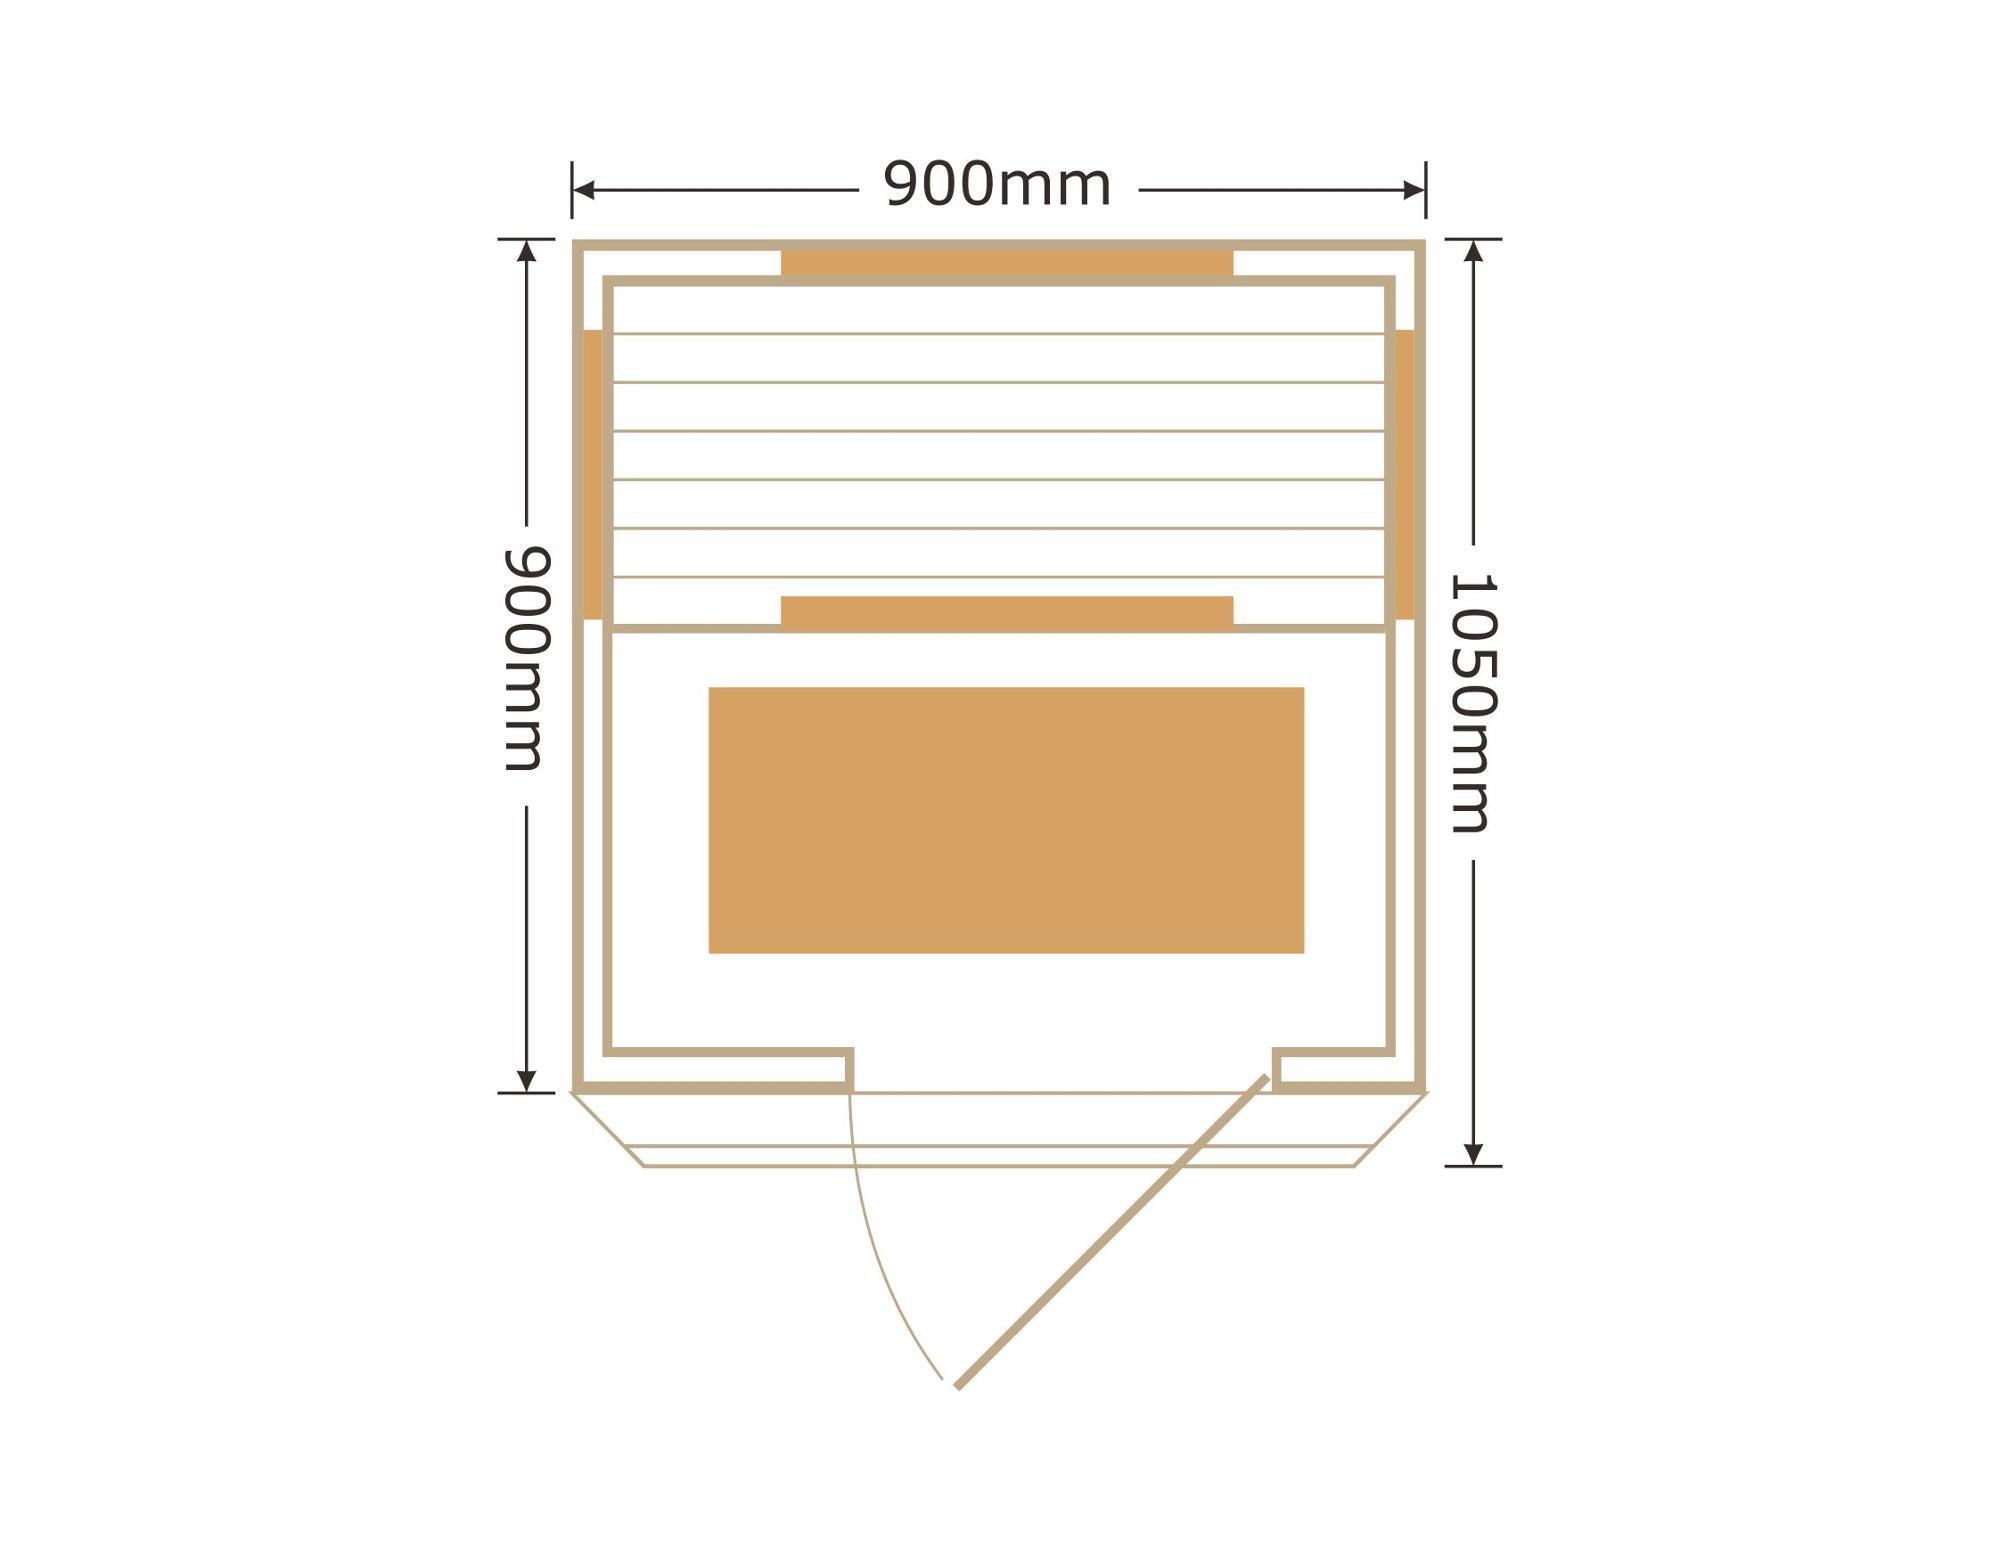 Infra Red Sauna Heating Elements Keys Backyard Sauna - Buy ...